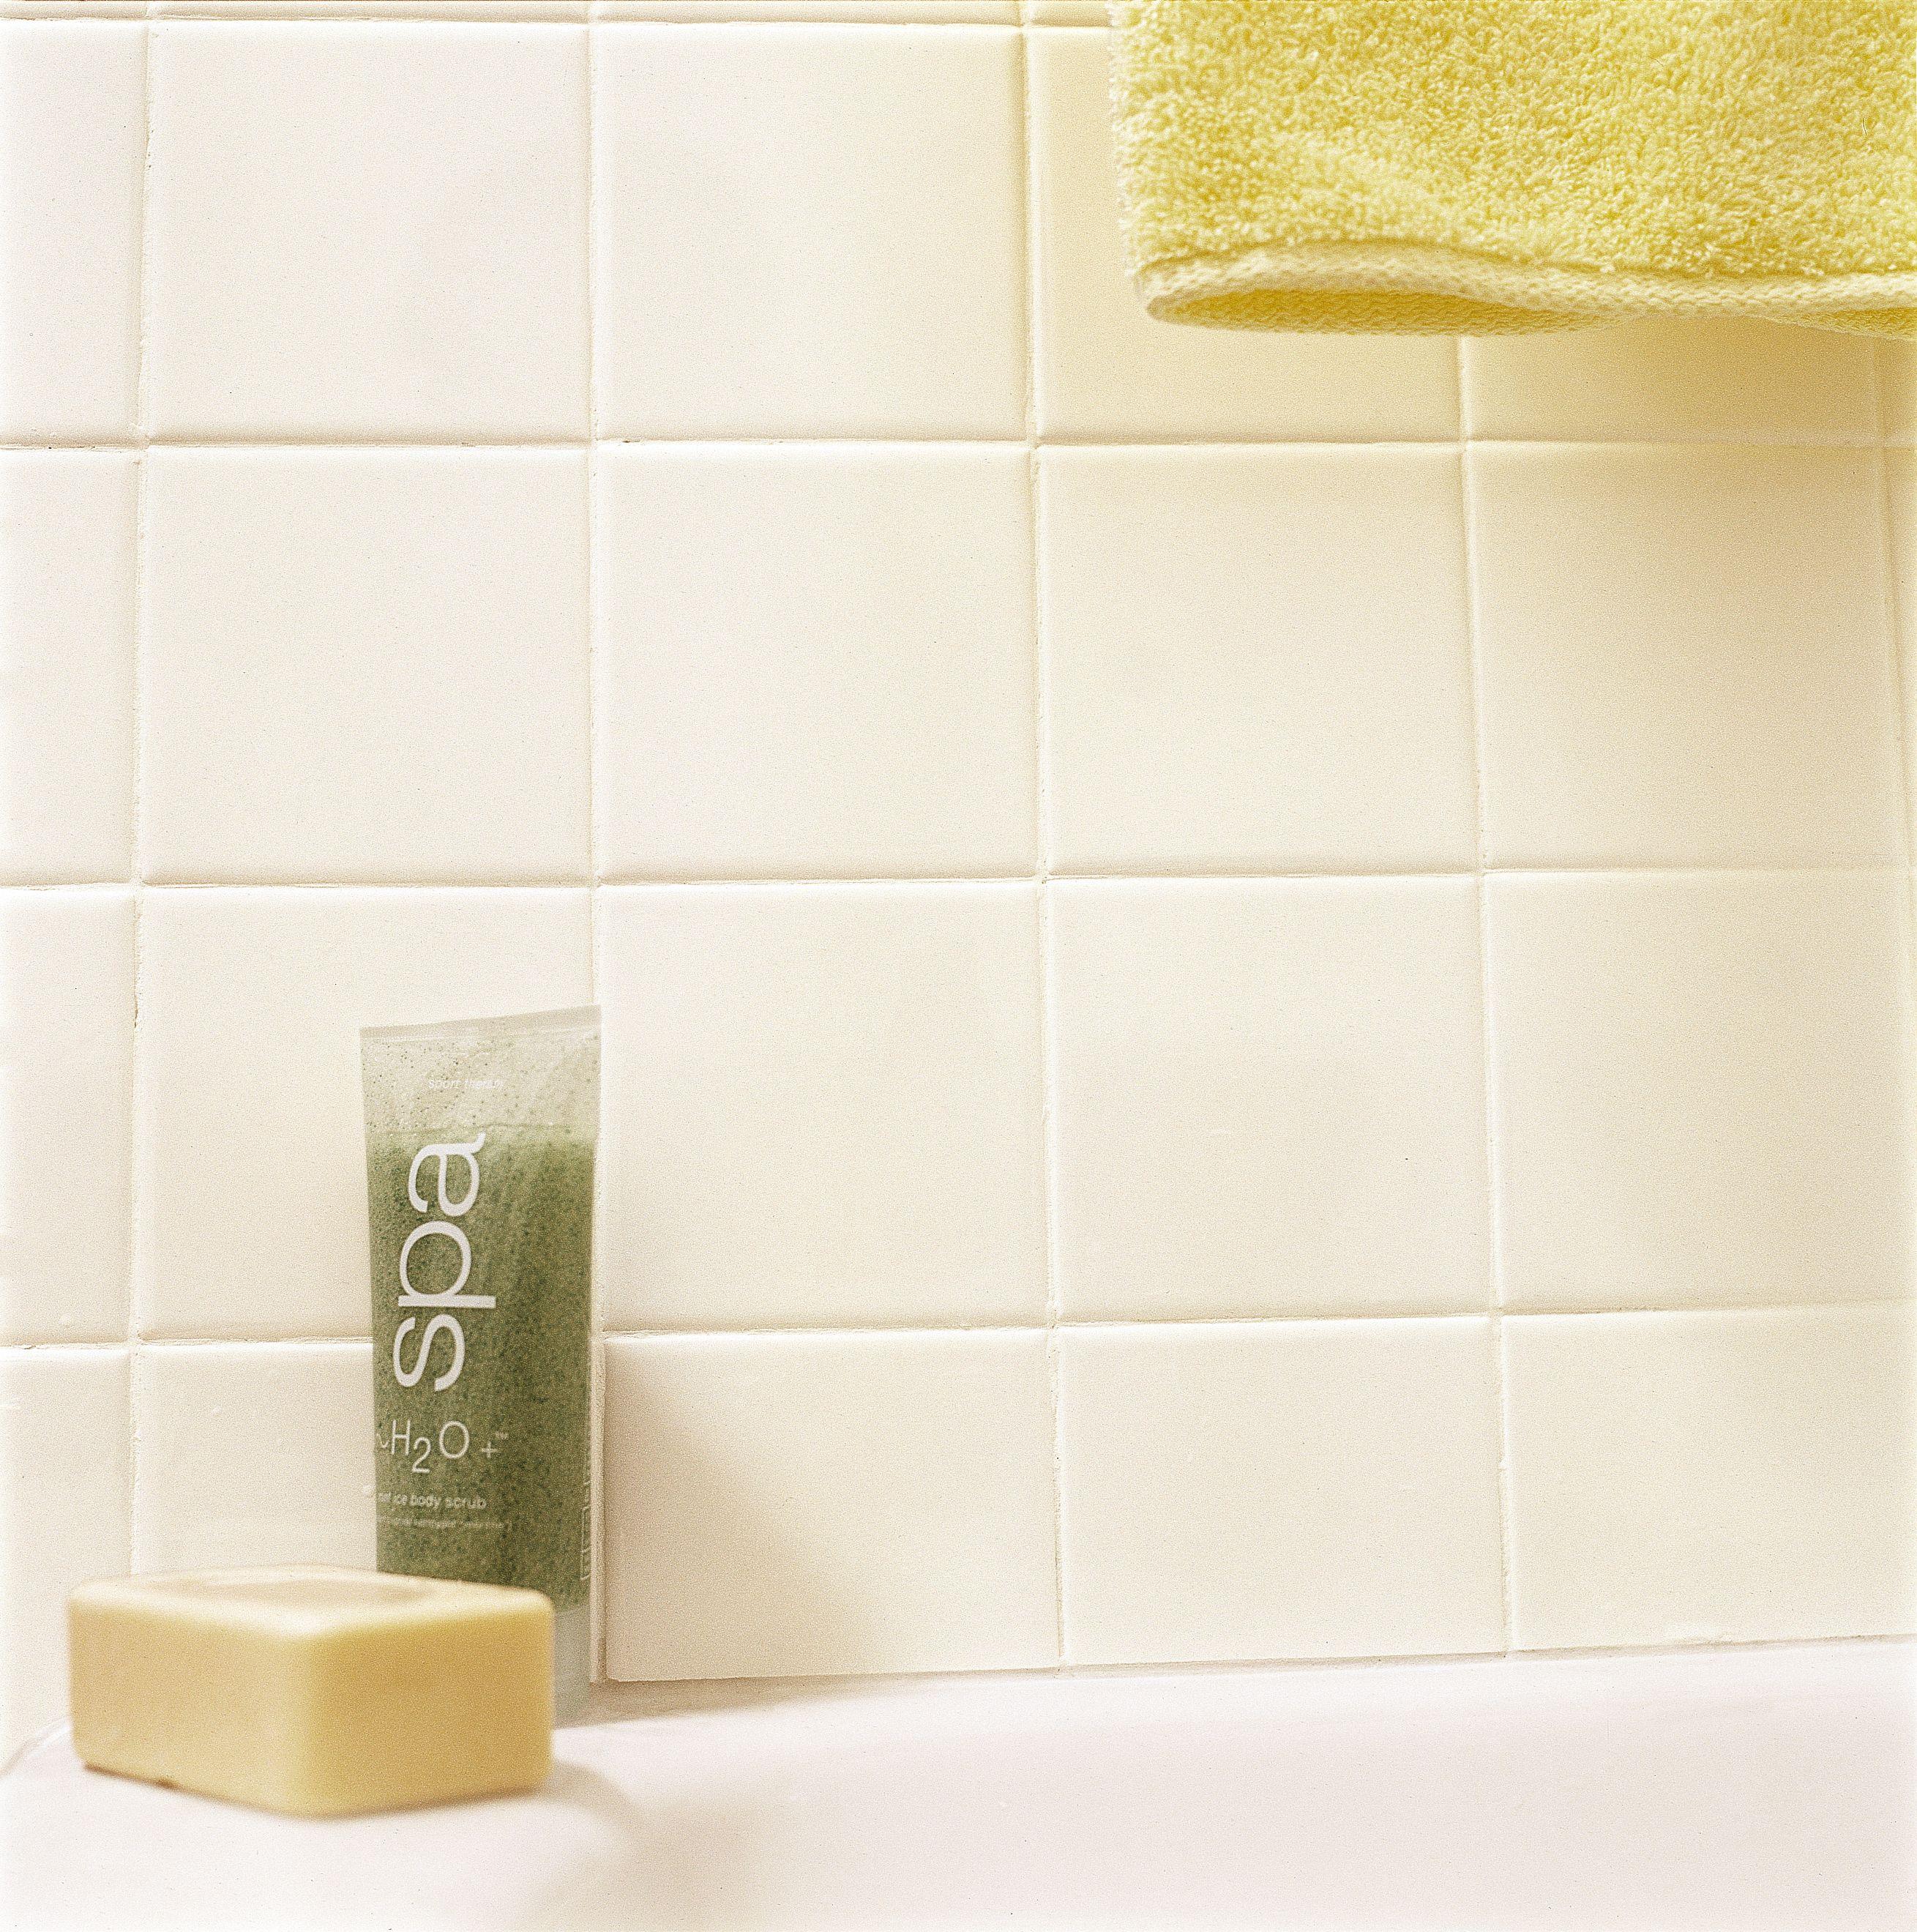 How to Tile Around a Tub | Pinterest | Wall tiles, Bathtub and Tubs